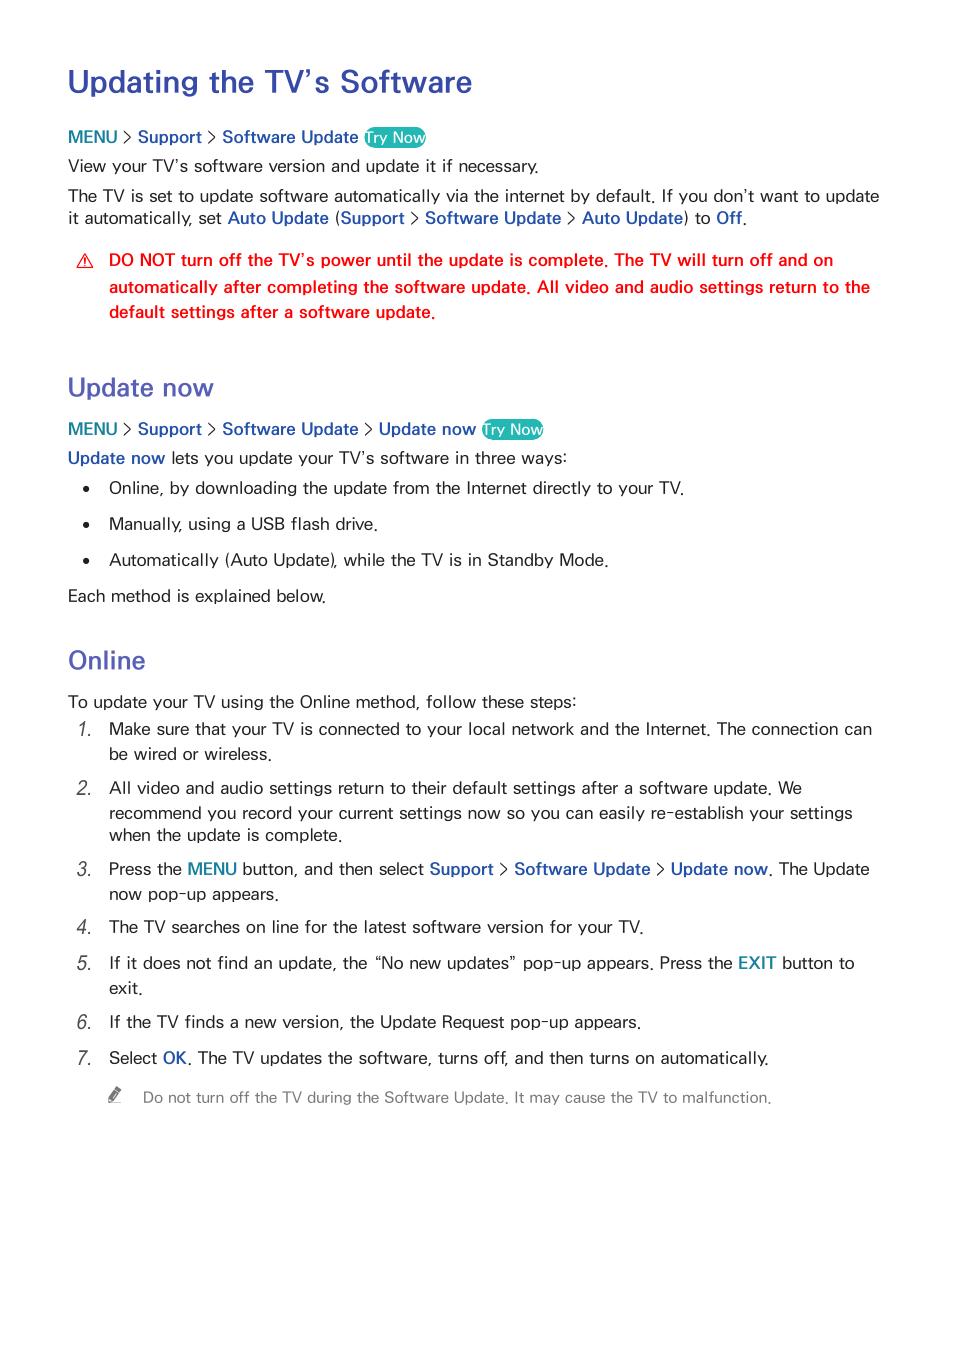 Updating the tv's software, 172 update now, 172 online